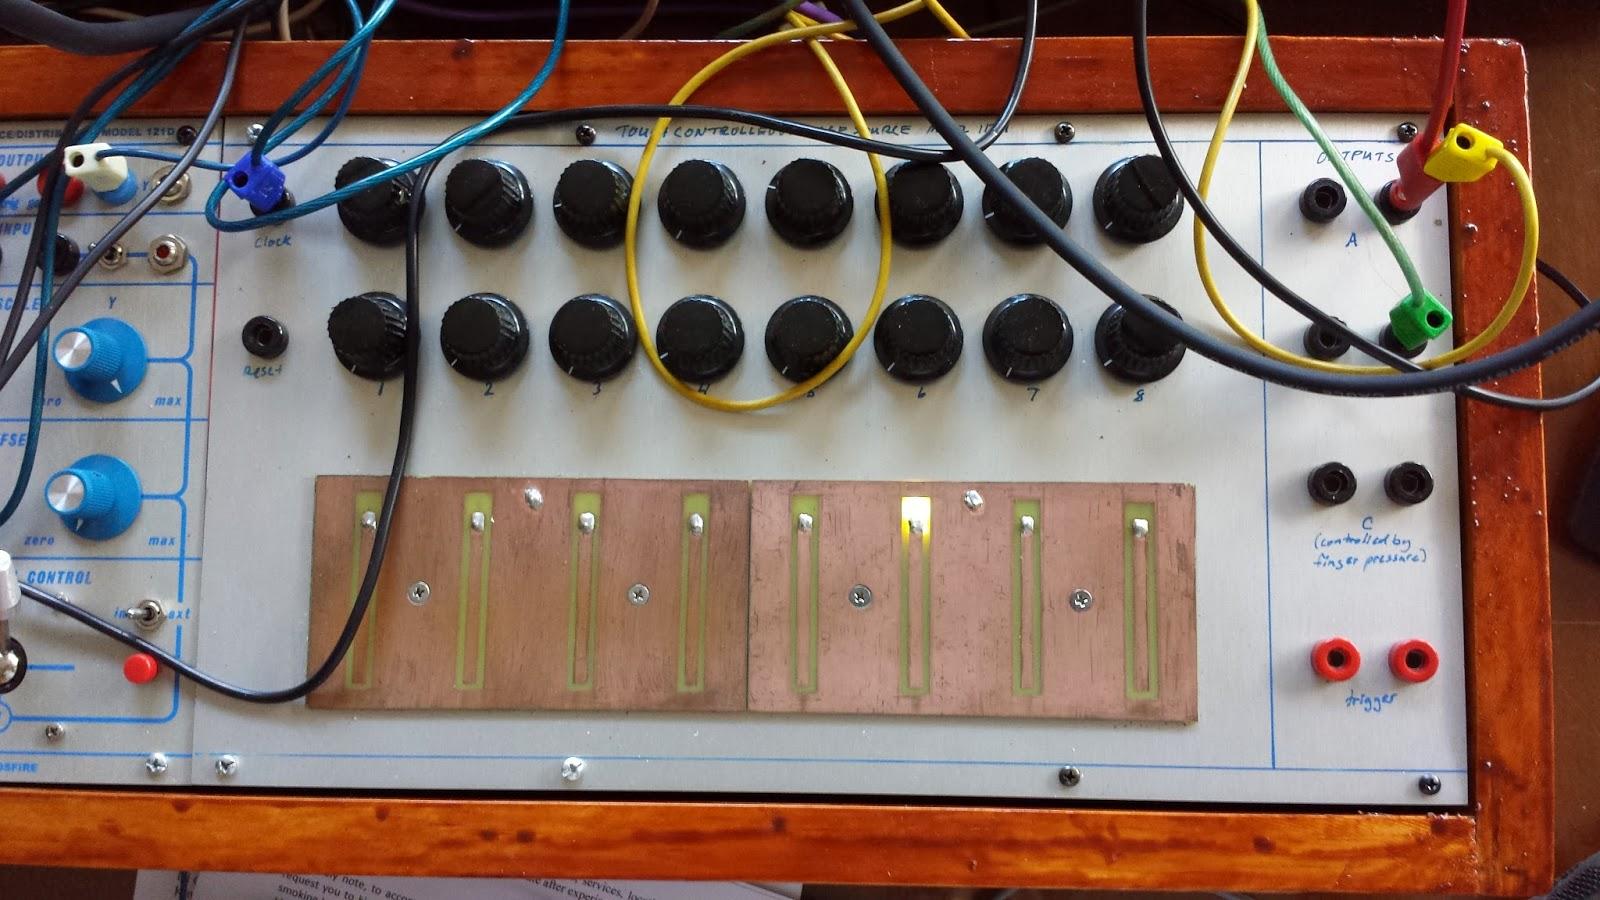 Sound Audio Oscillator Circuitne555cd4017 Oscillatorcircuit